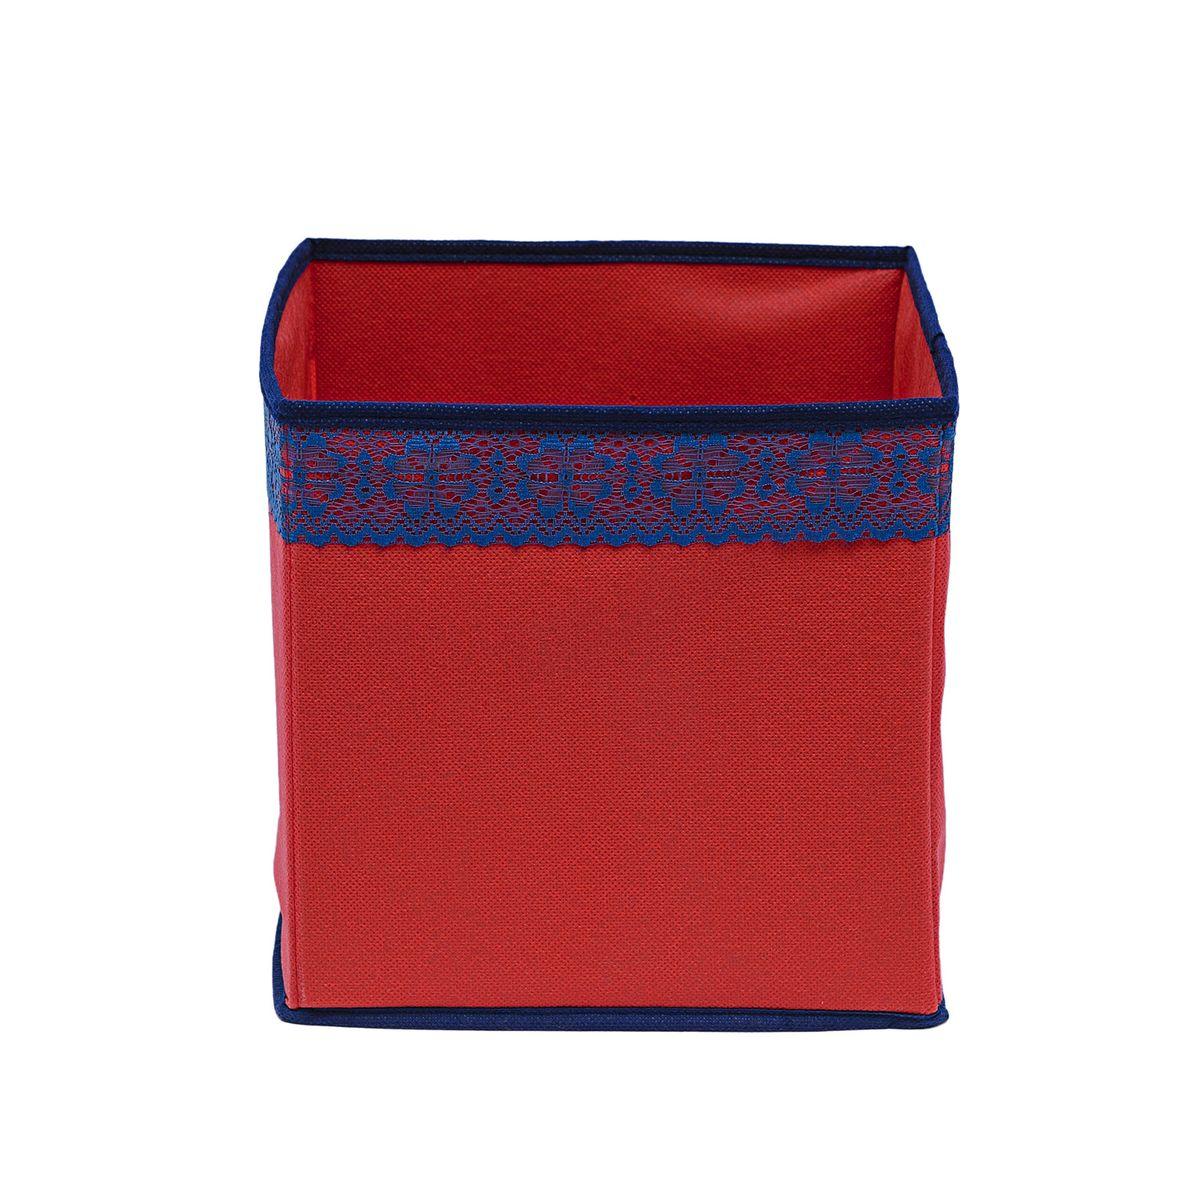 "Кофр для хранения Homsu ""Rosso"", 22 х 22 х 22 см"